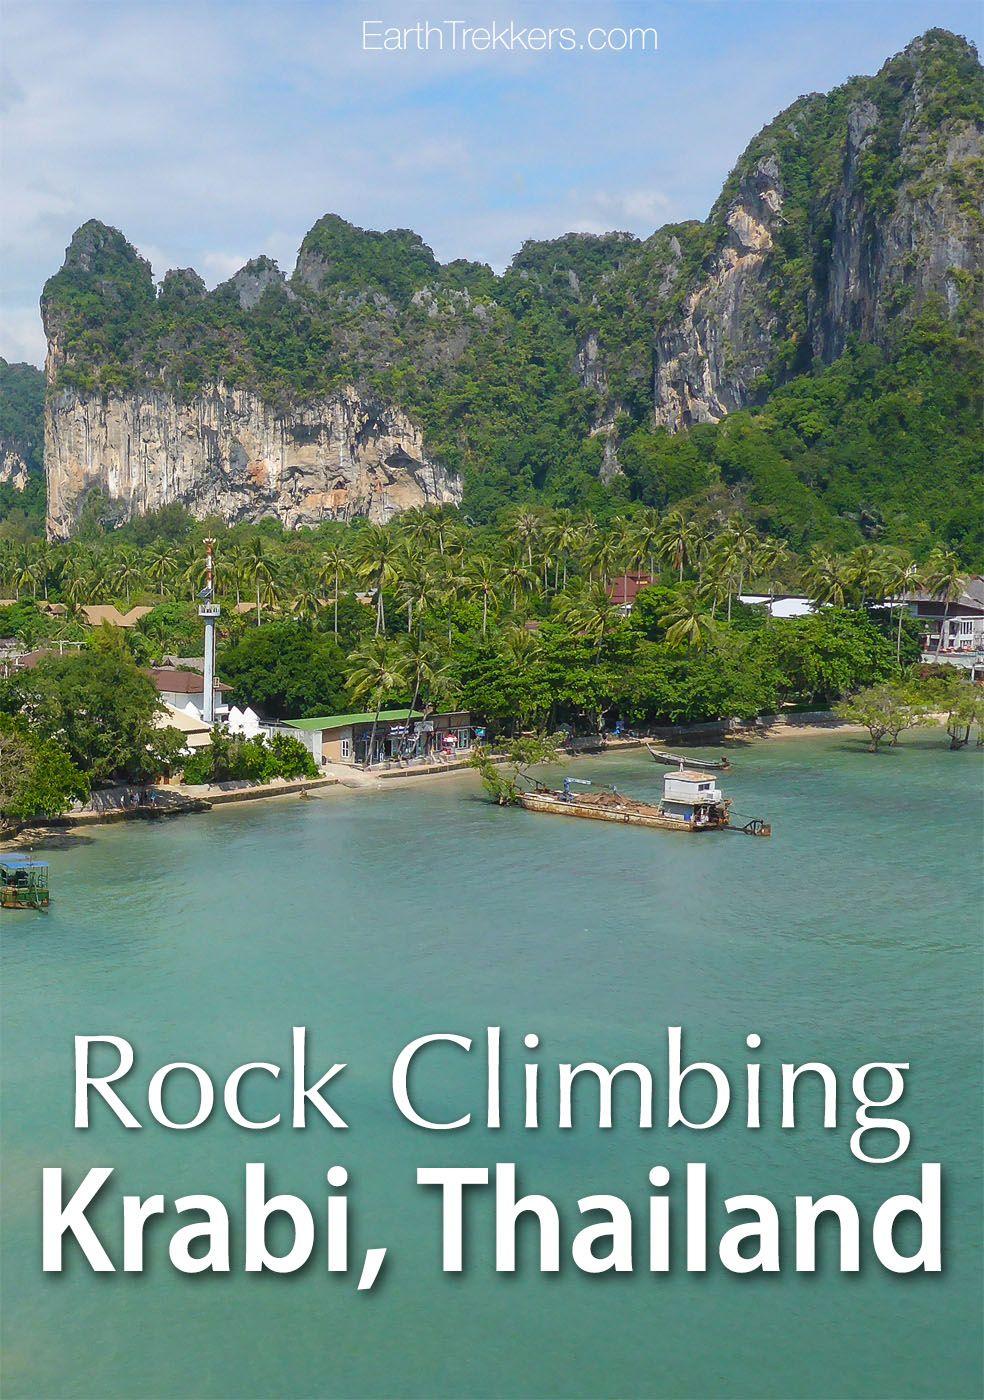 Rock Climbing Krabi Thailand